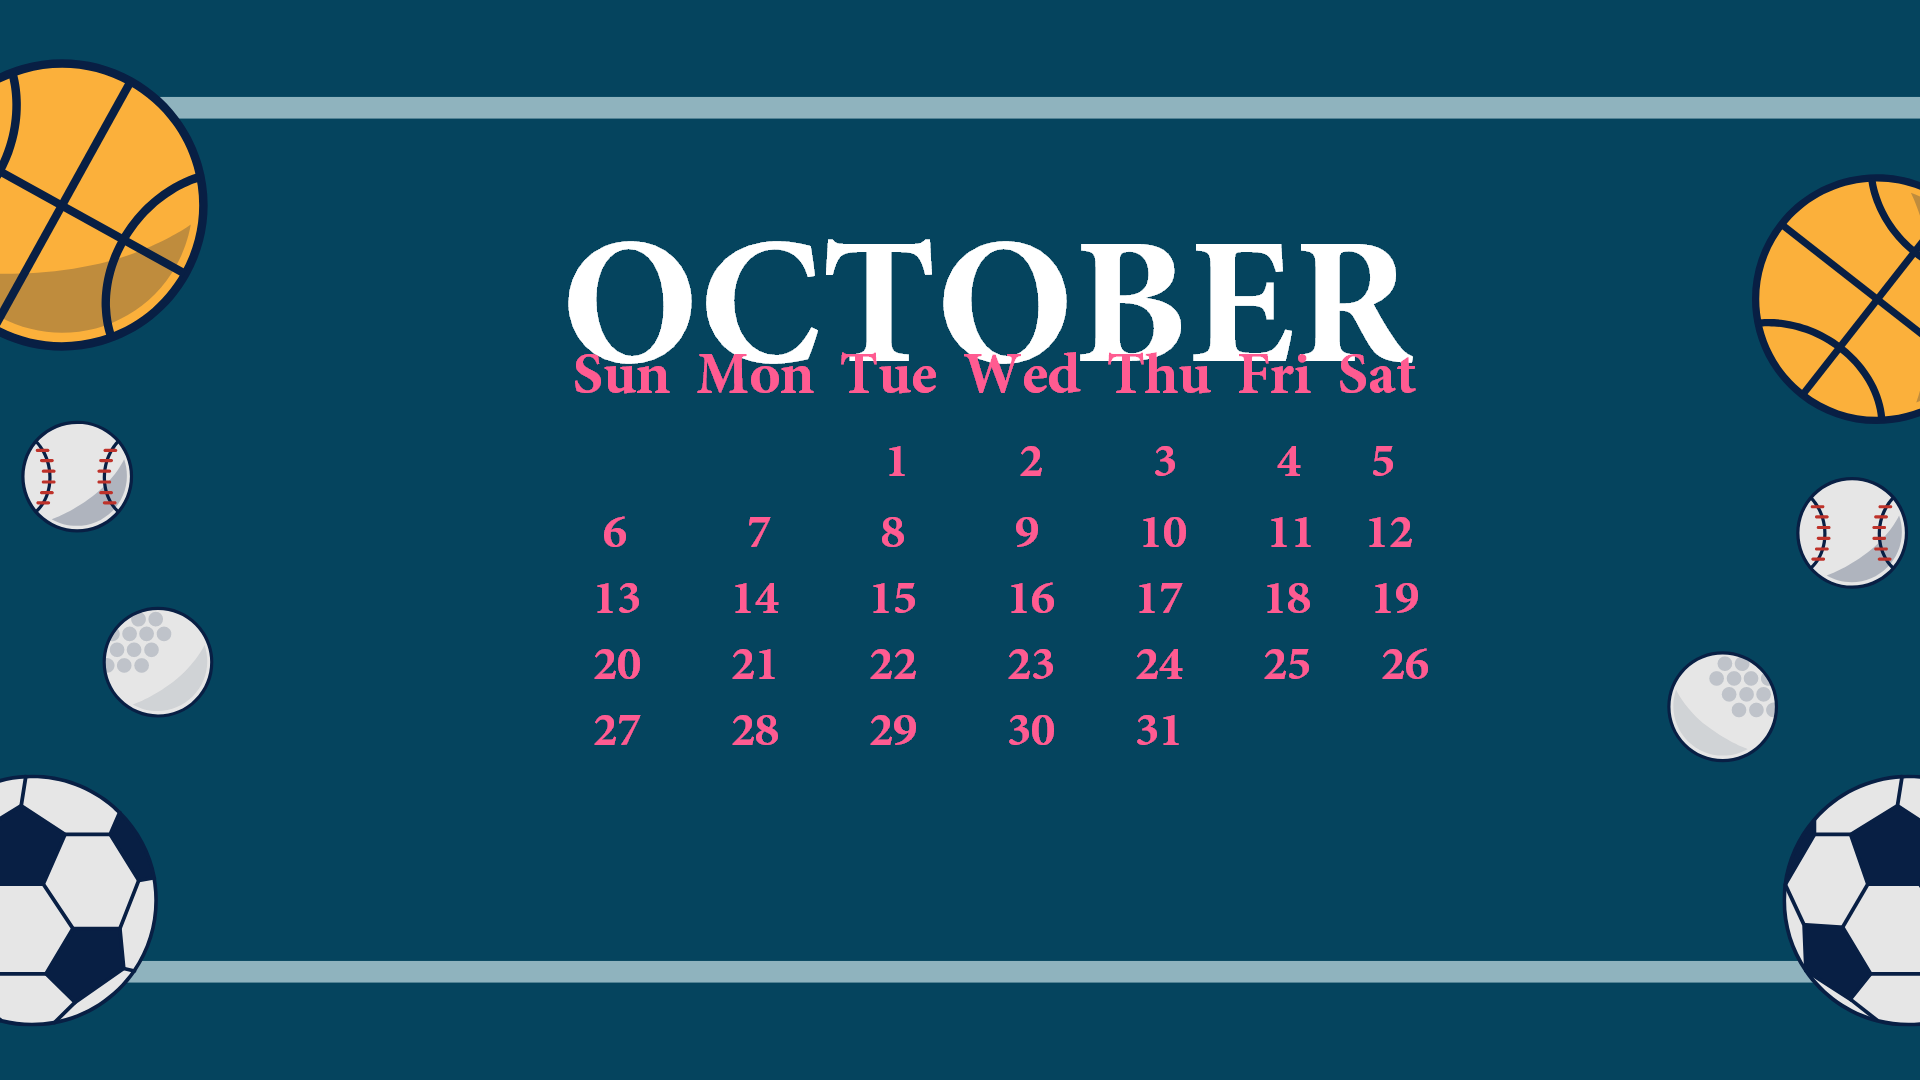 October 2019 Desktop Wallpaper With Calendar